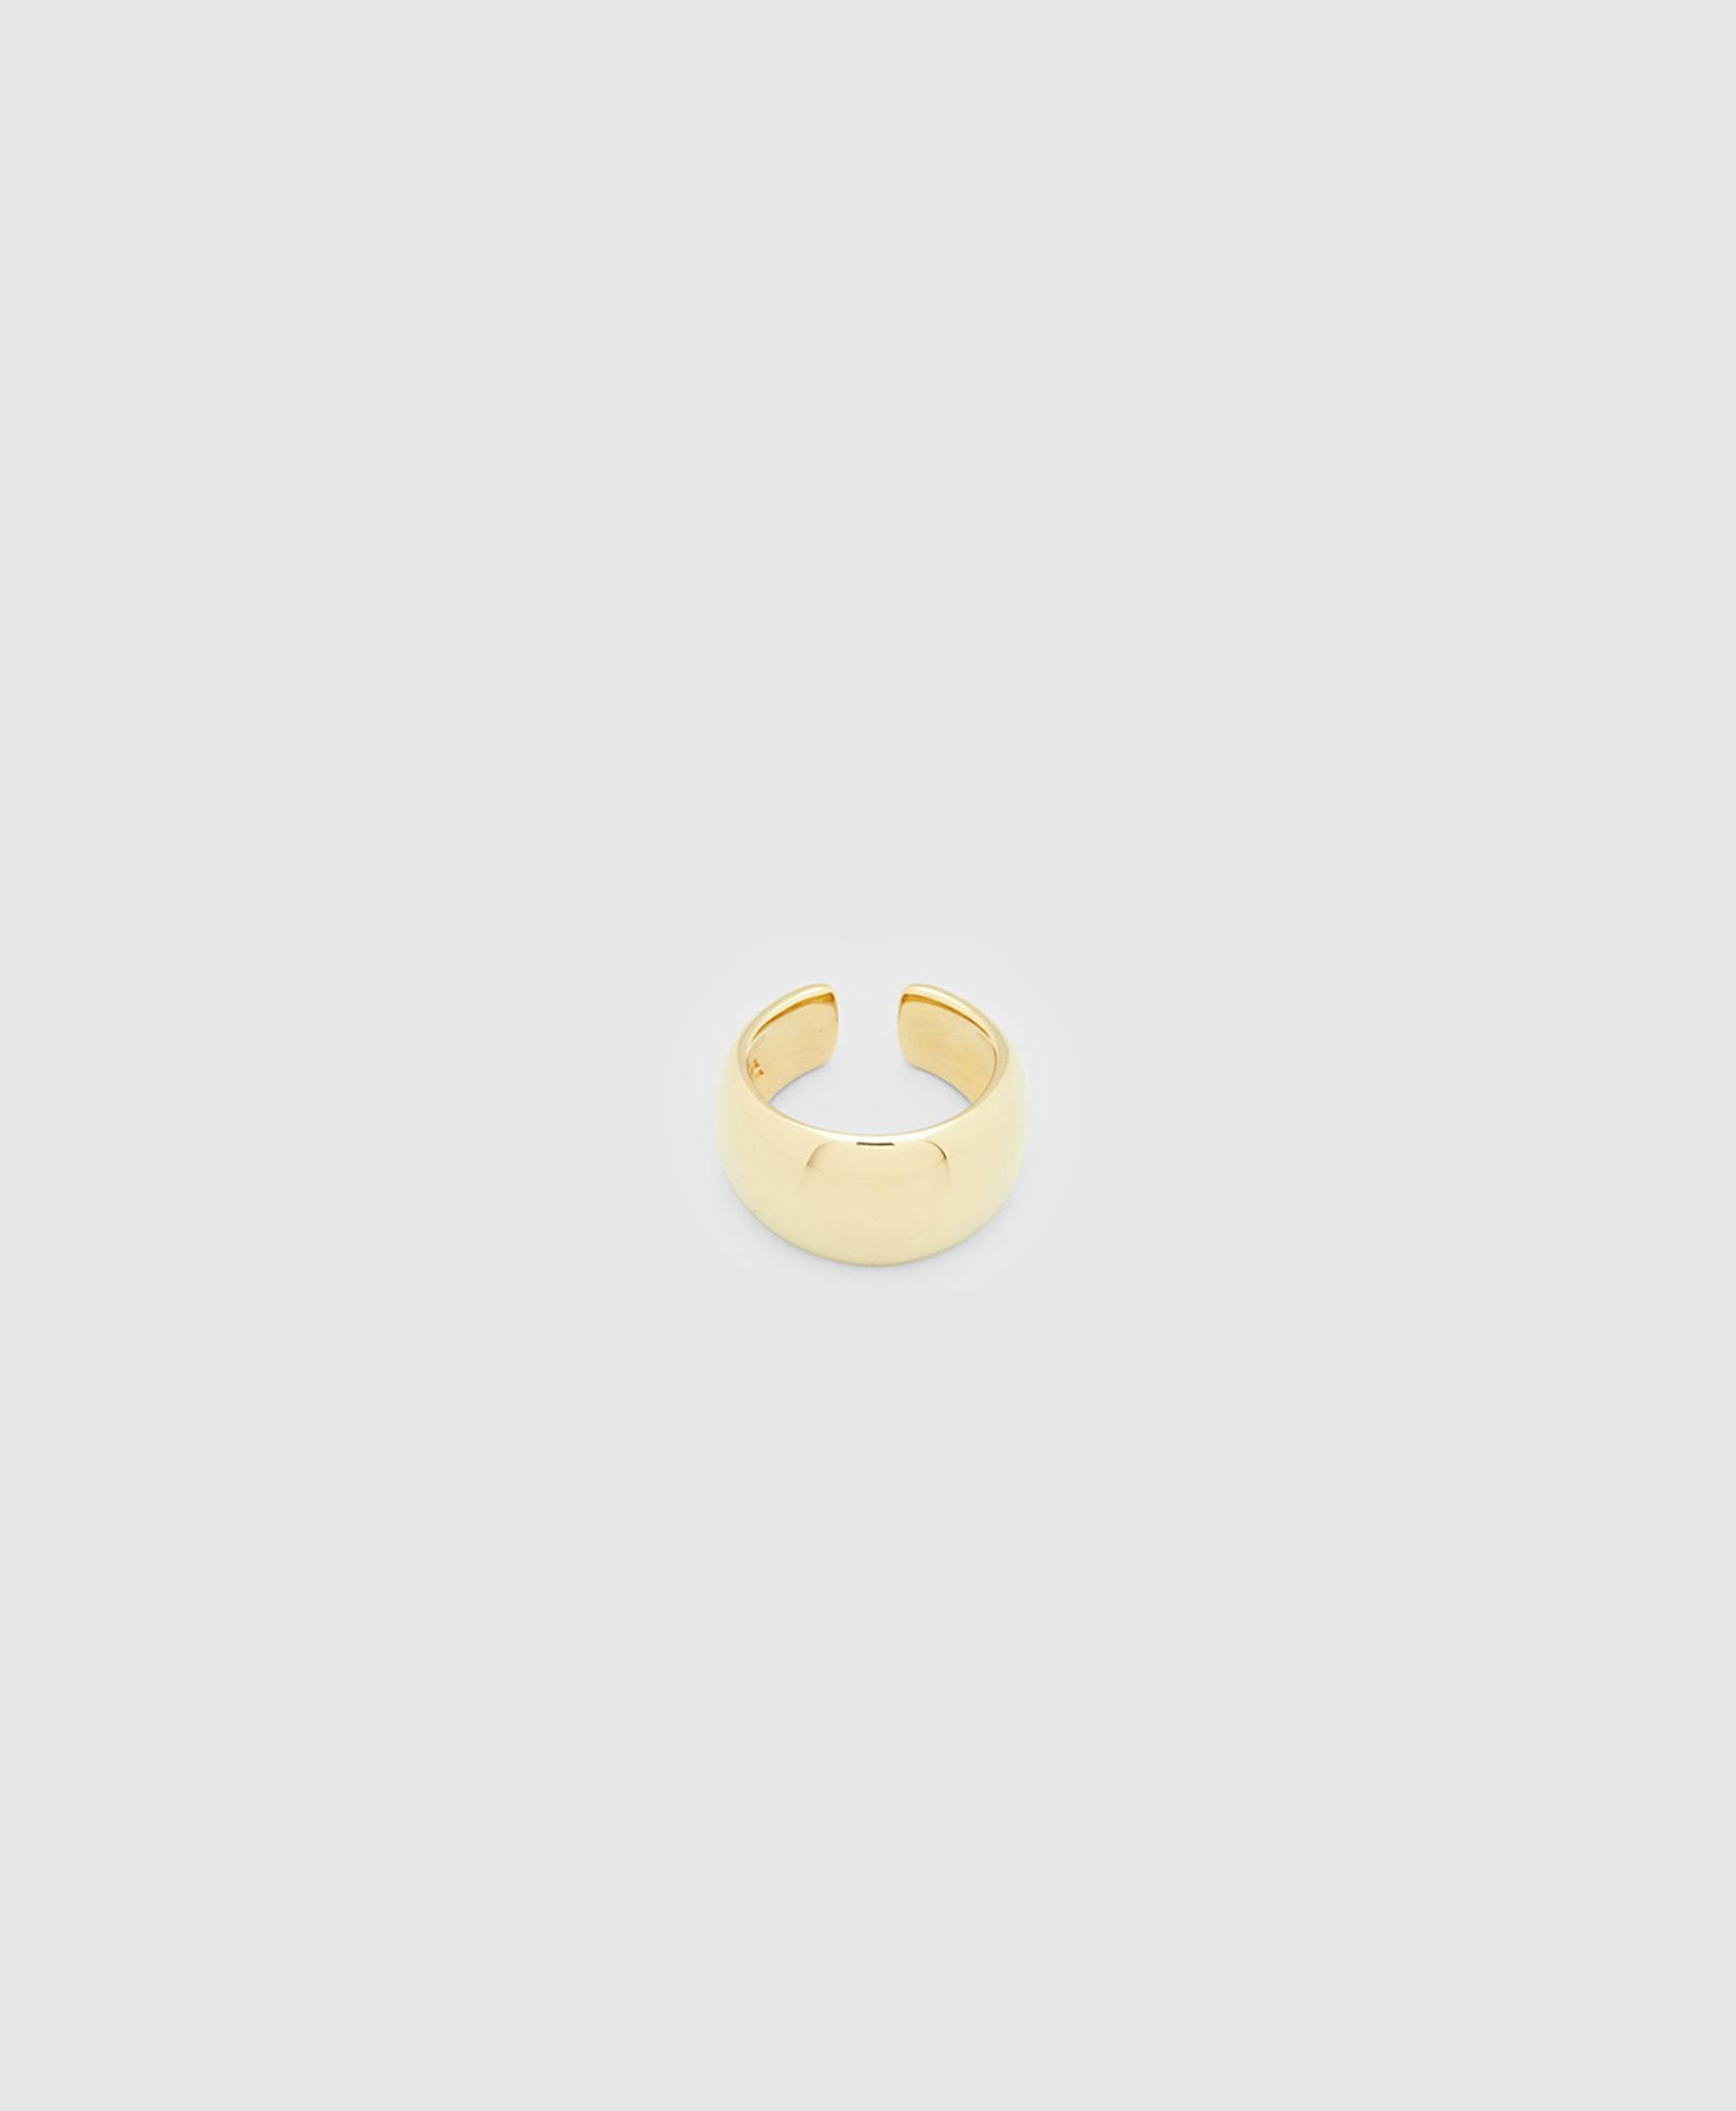 Chubby Ear Cuff Gold